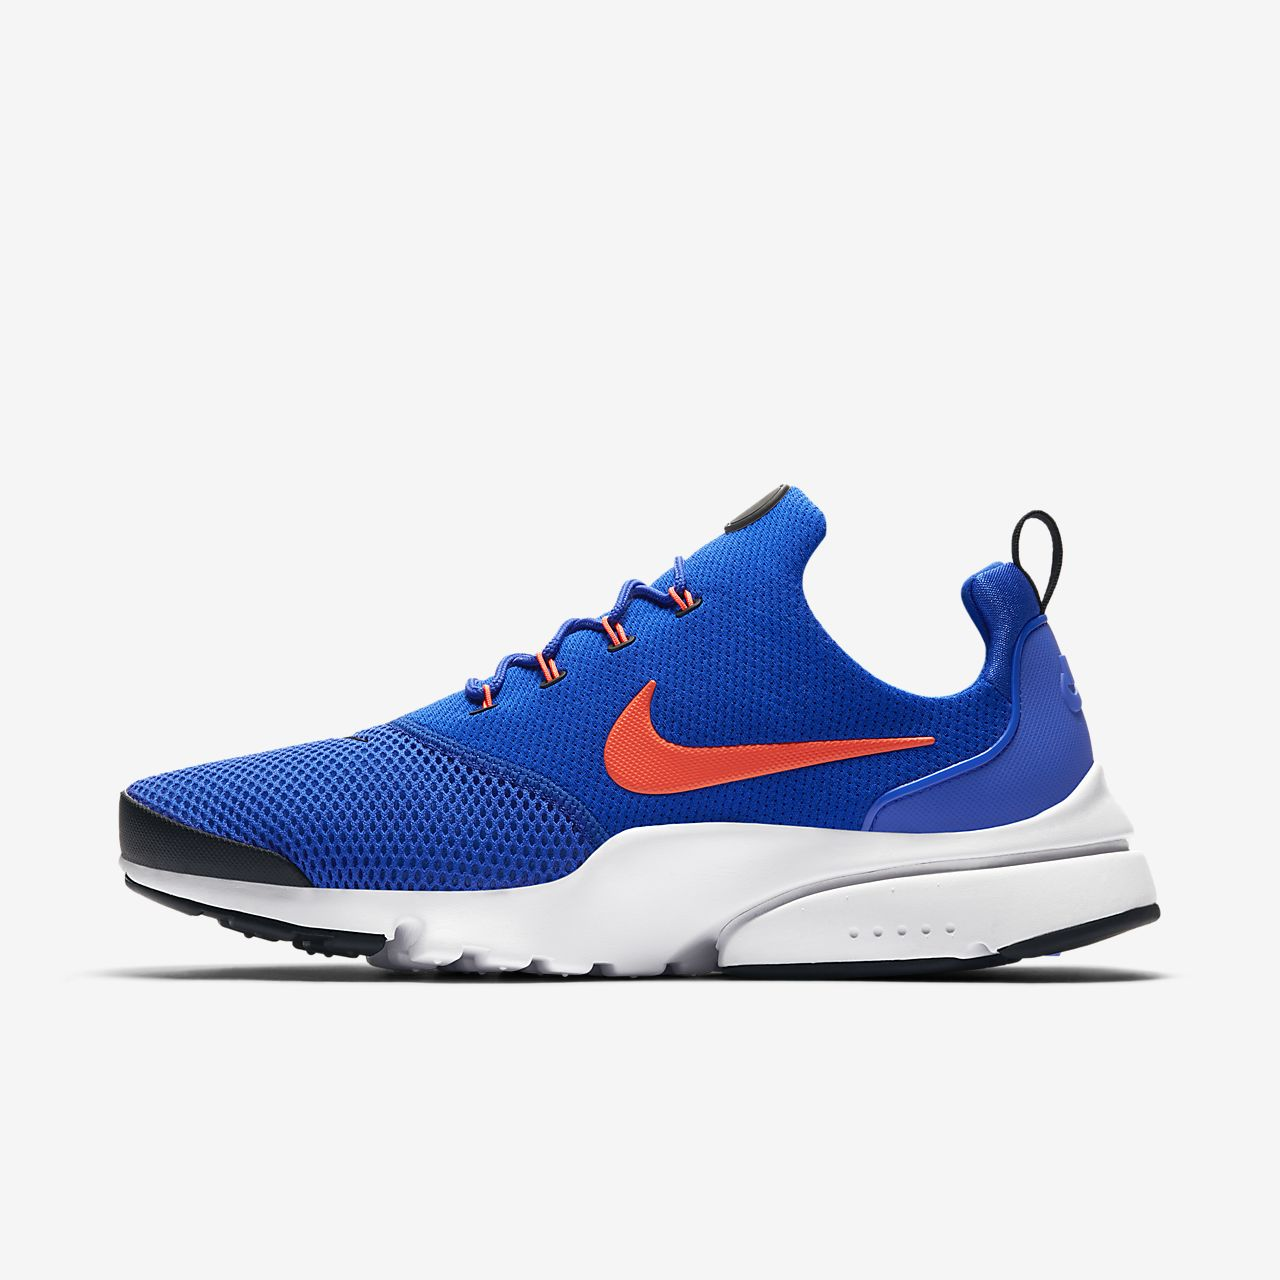 Pour Chaussure Nike HommeMa Fly Presto Yfyg6b7